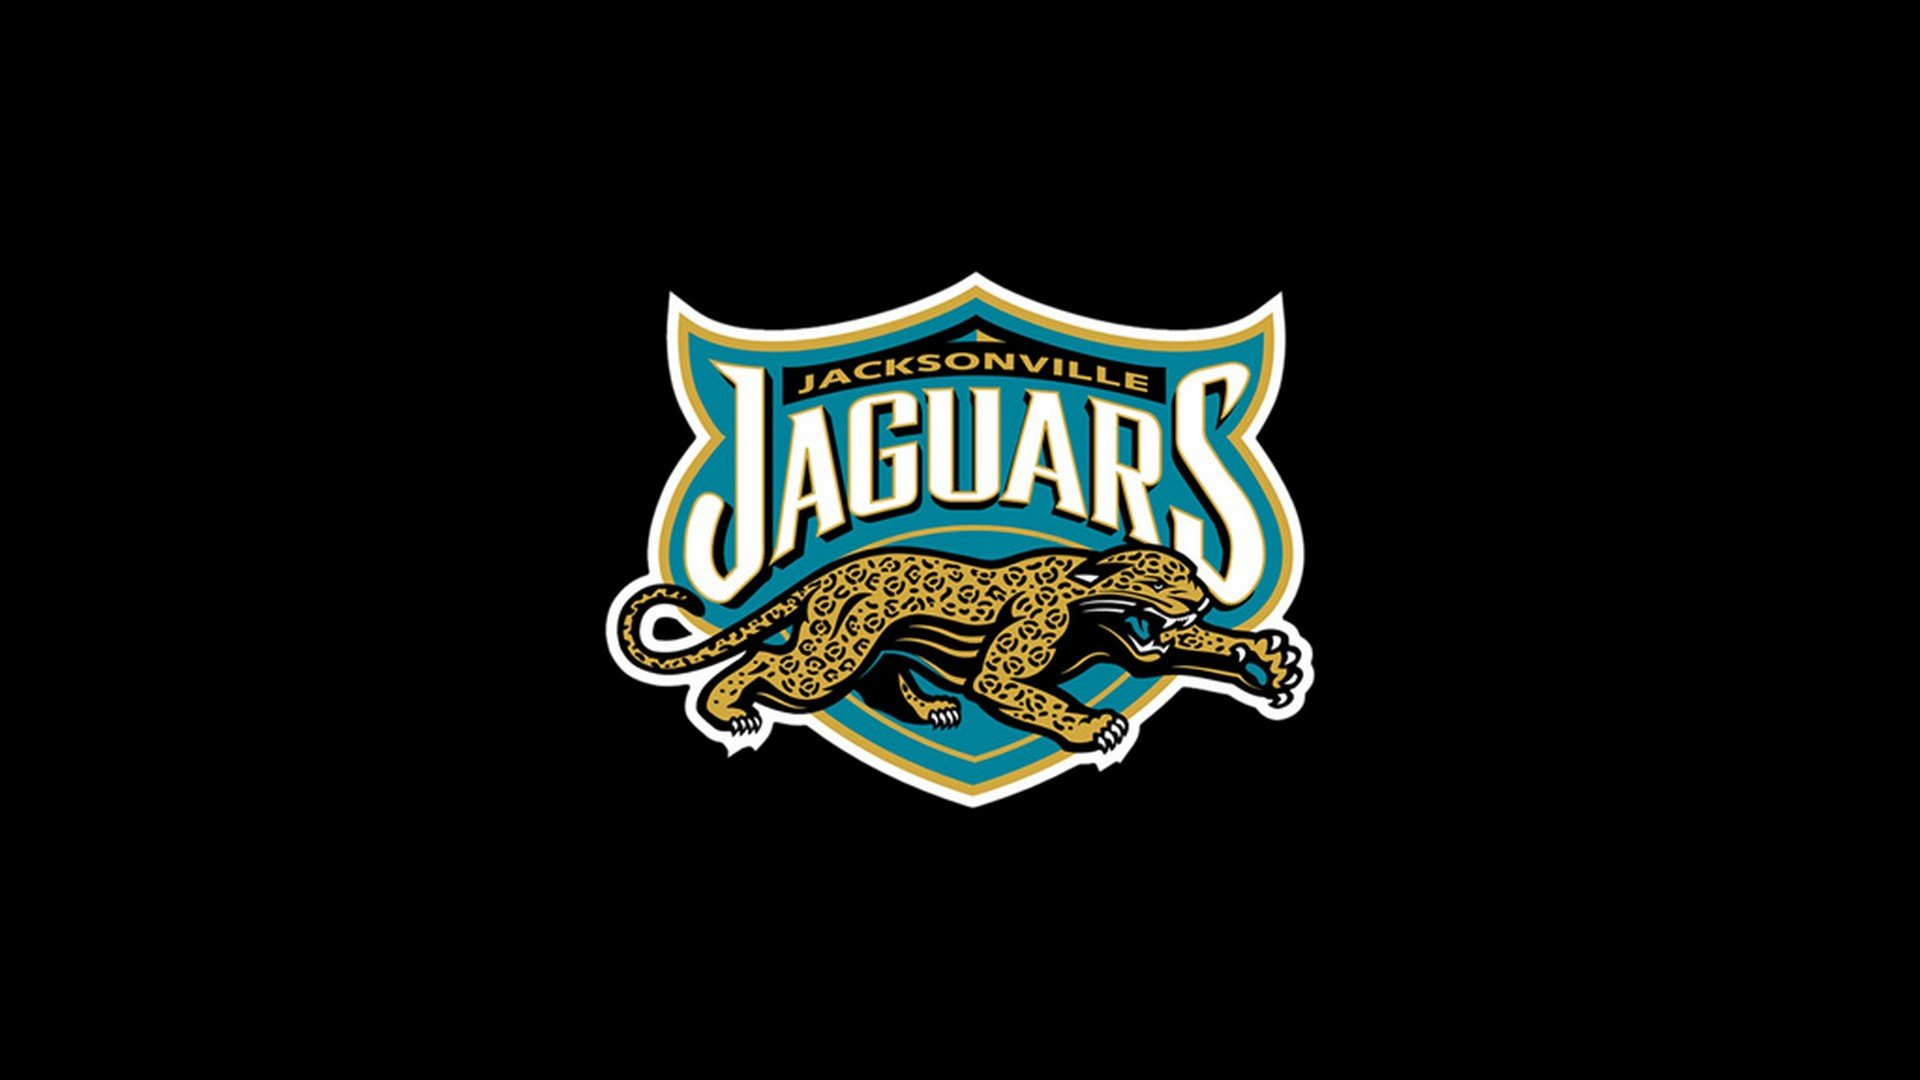 Wallpapers HD Jacksonville Jaguars 2019 NFL Football Wallpapers 1920x1080